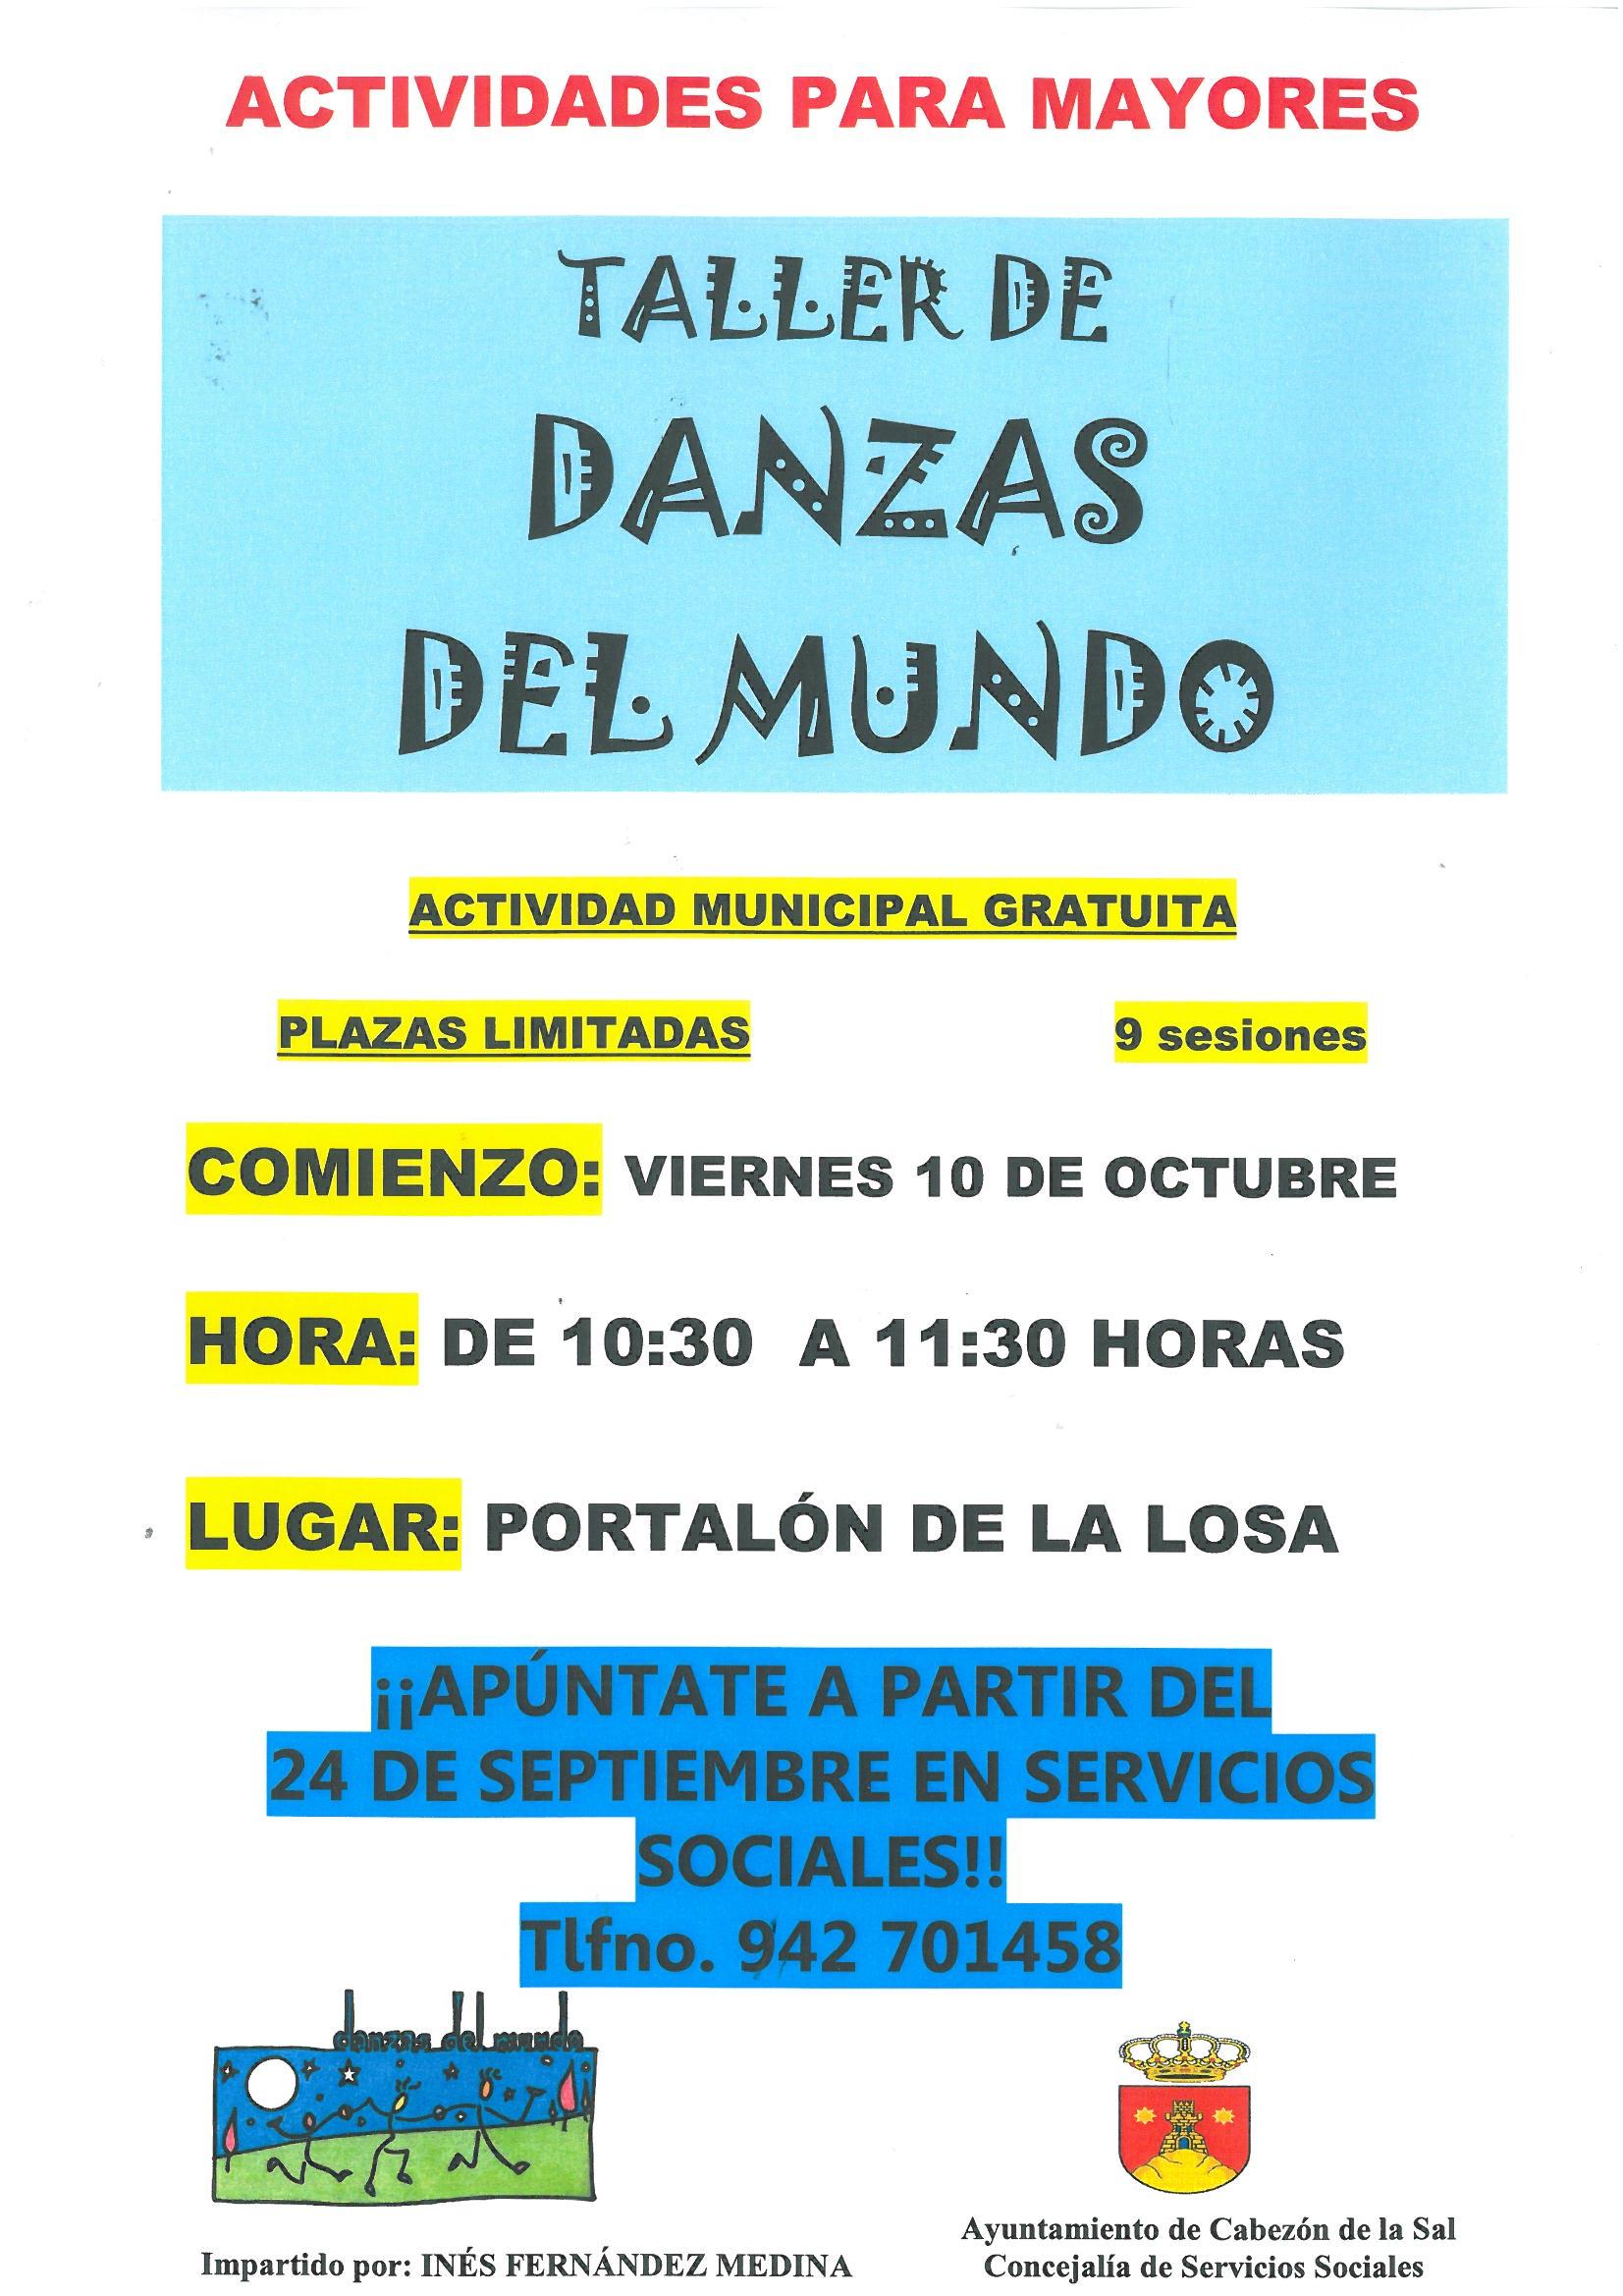 http://www.cabezondelasal.net/wp-content/uploads/2014/09/taller-danzas-del-mundo.jpg